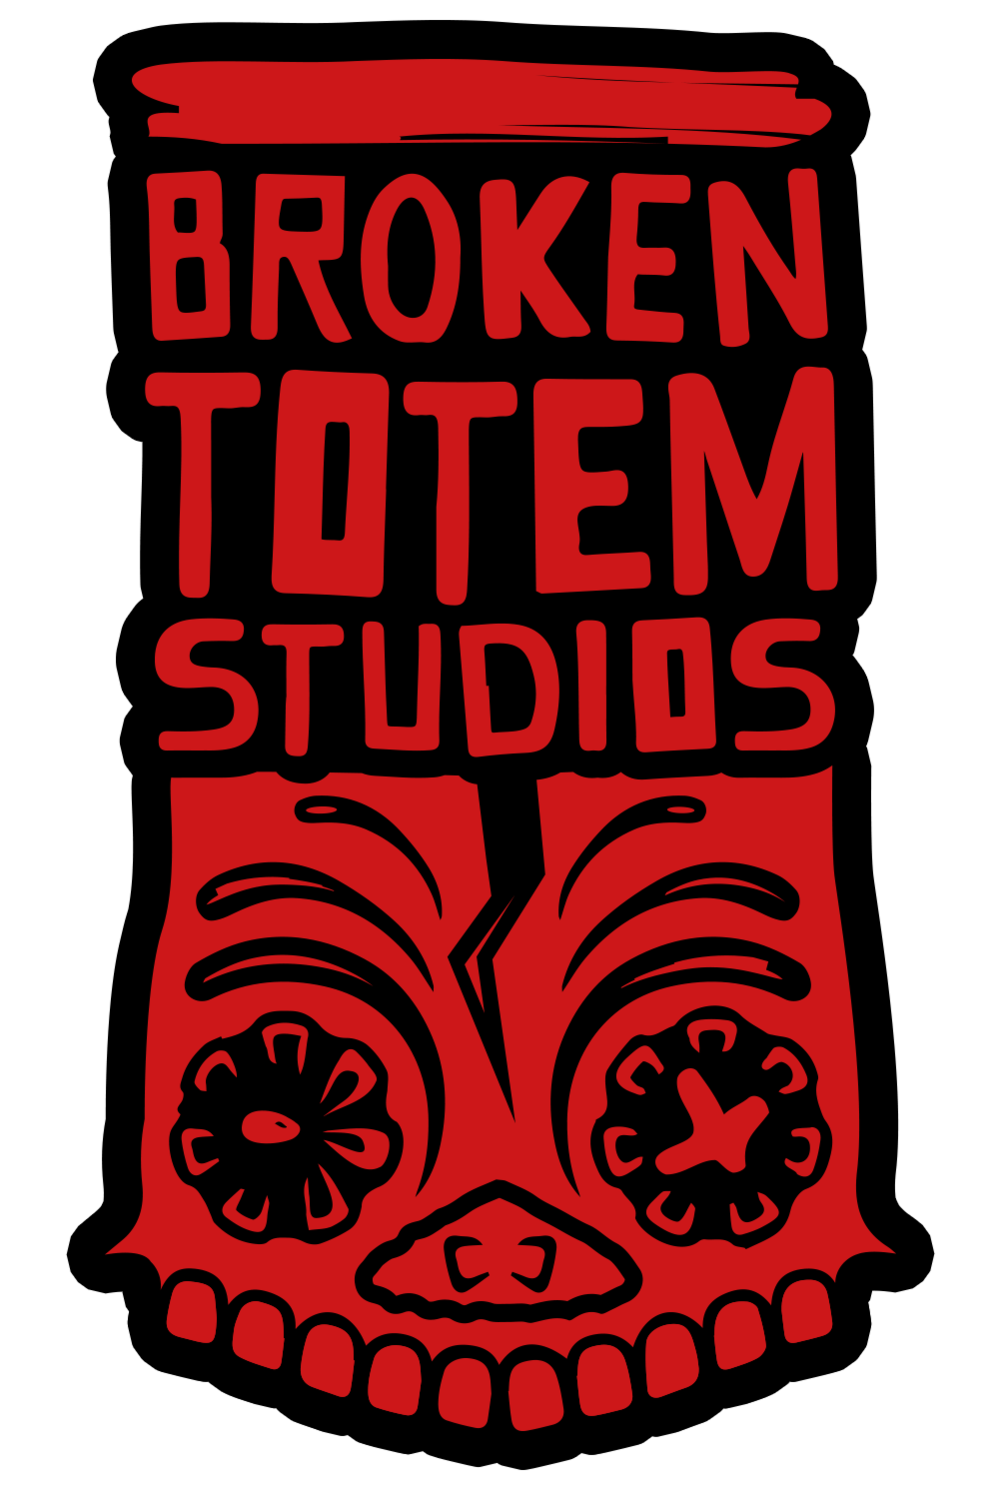 BrokenTotemStudiosLogo.png